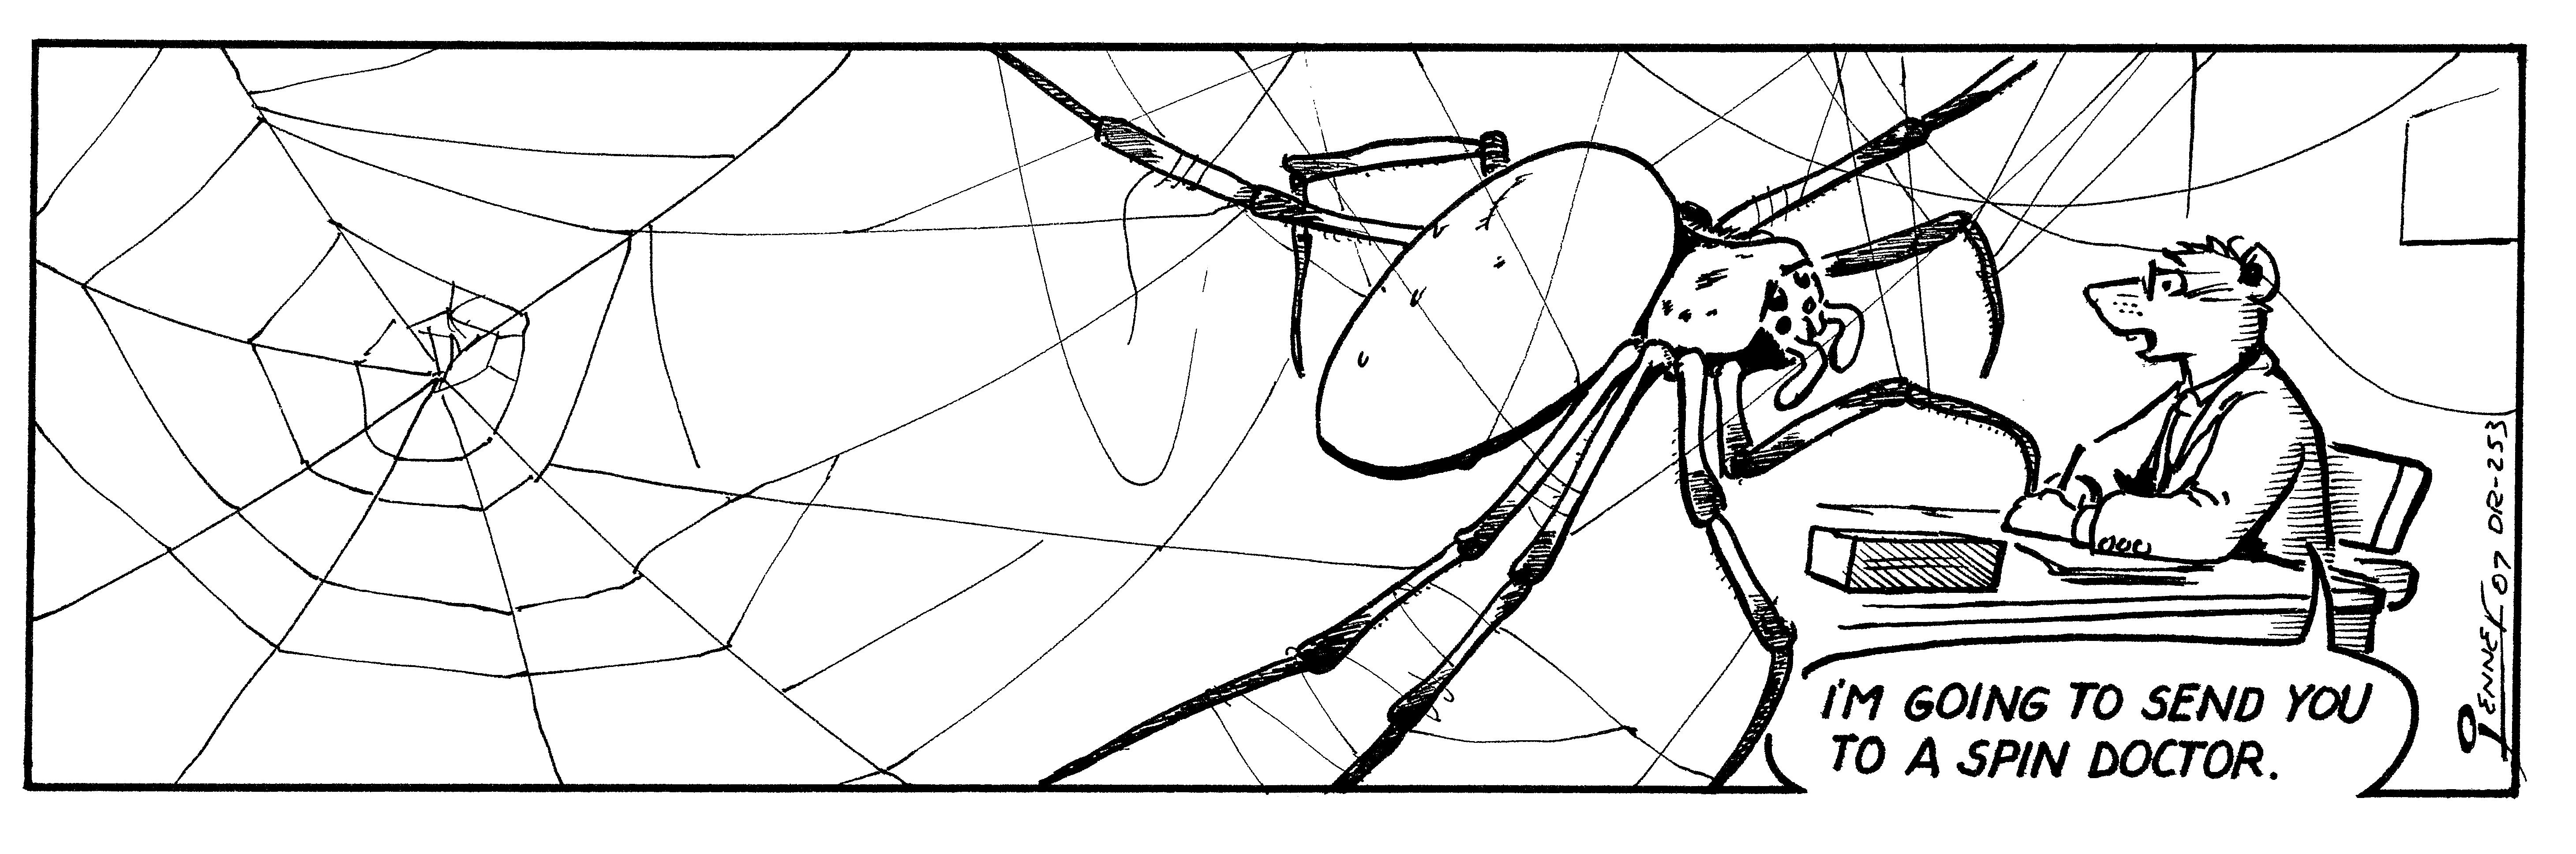 20070613